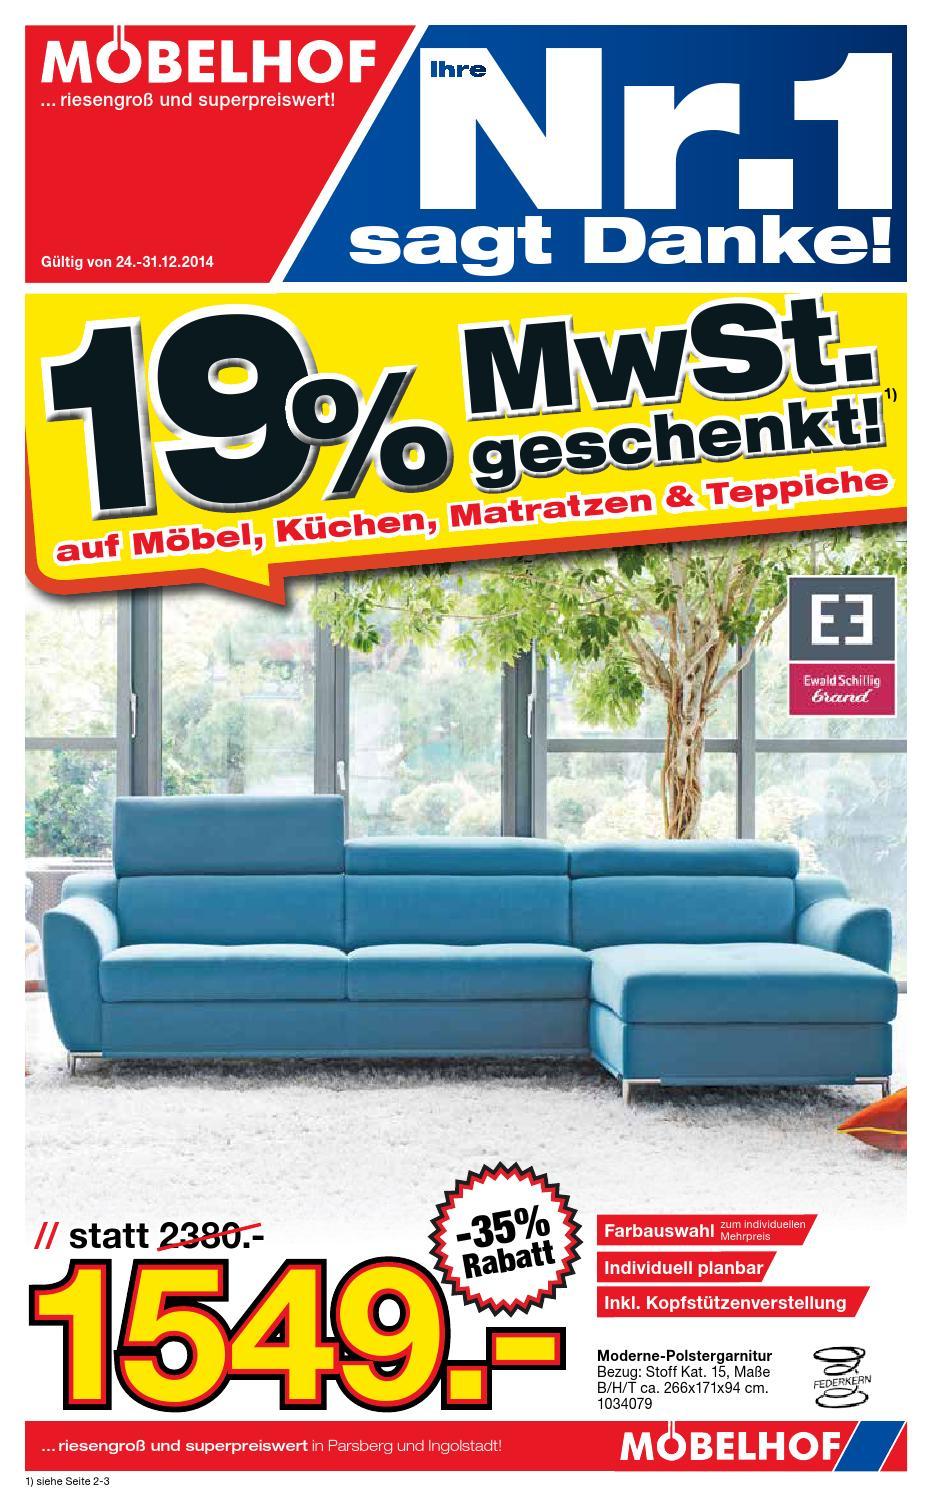 moebelhof prospekt kw50 2014 by perspektive werbeagentur. Black Bedroom Furniture Sets. Home Design Ideas